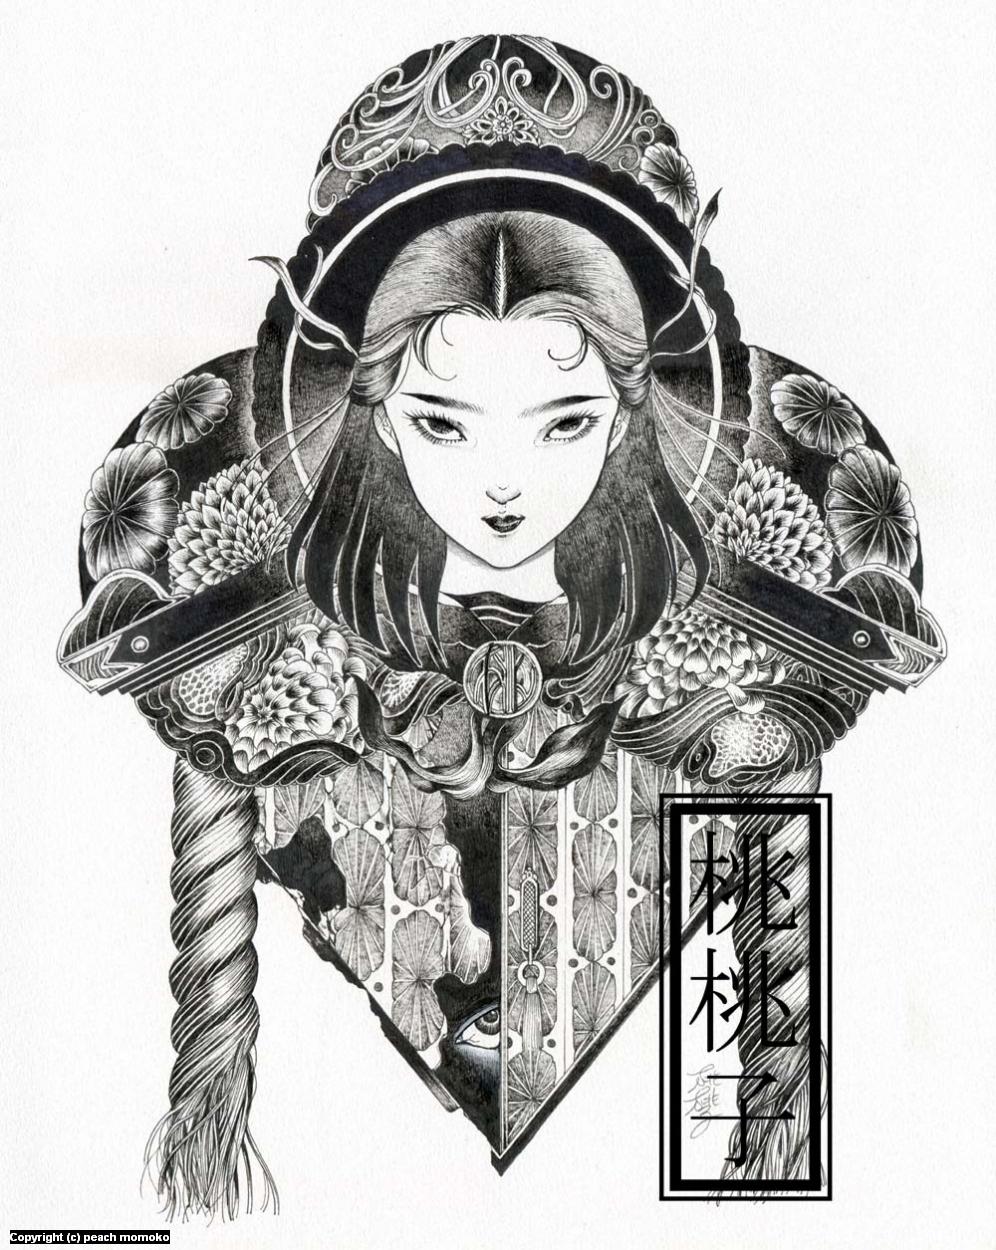 Hakai & Saisei: Nozoki Artwork by MoMoKo Peach